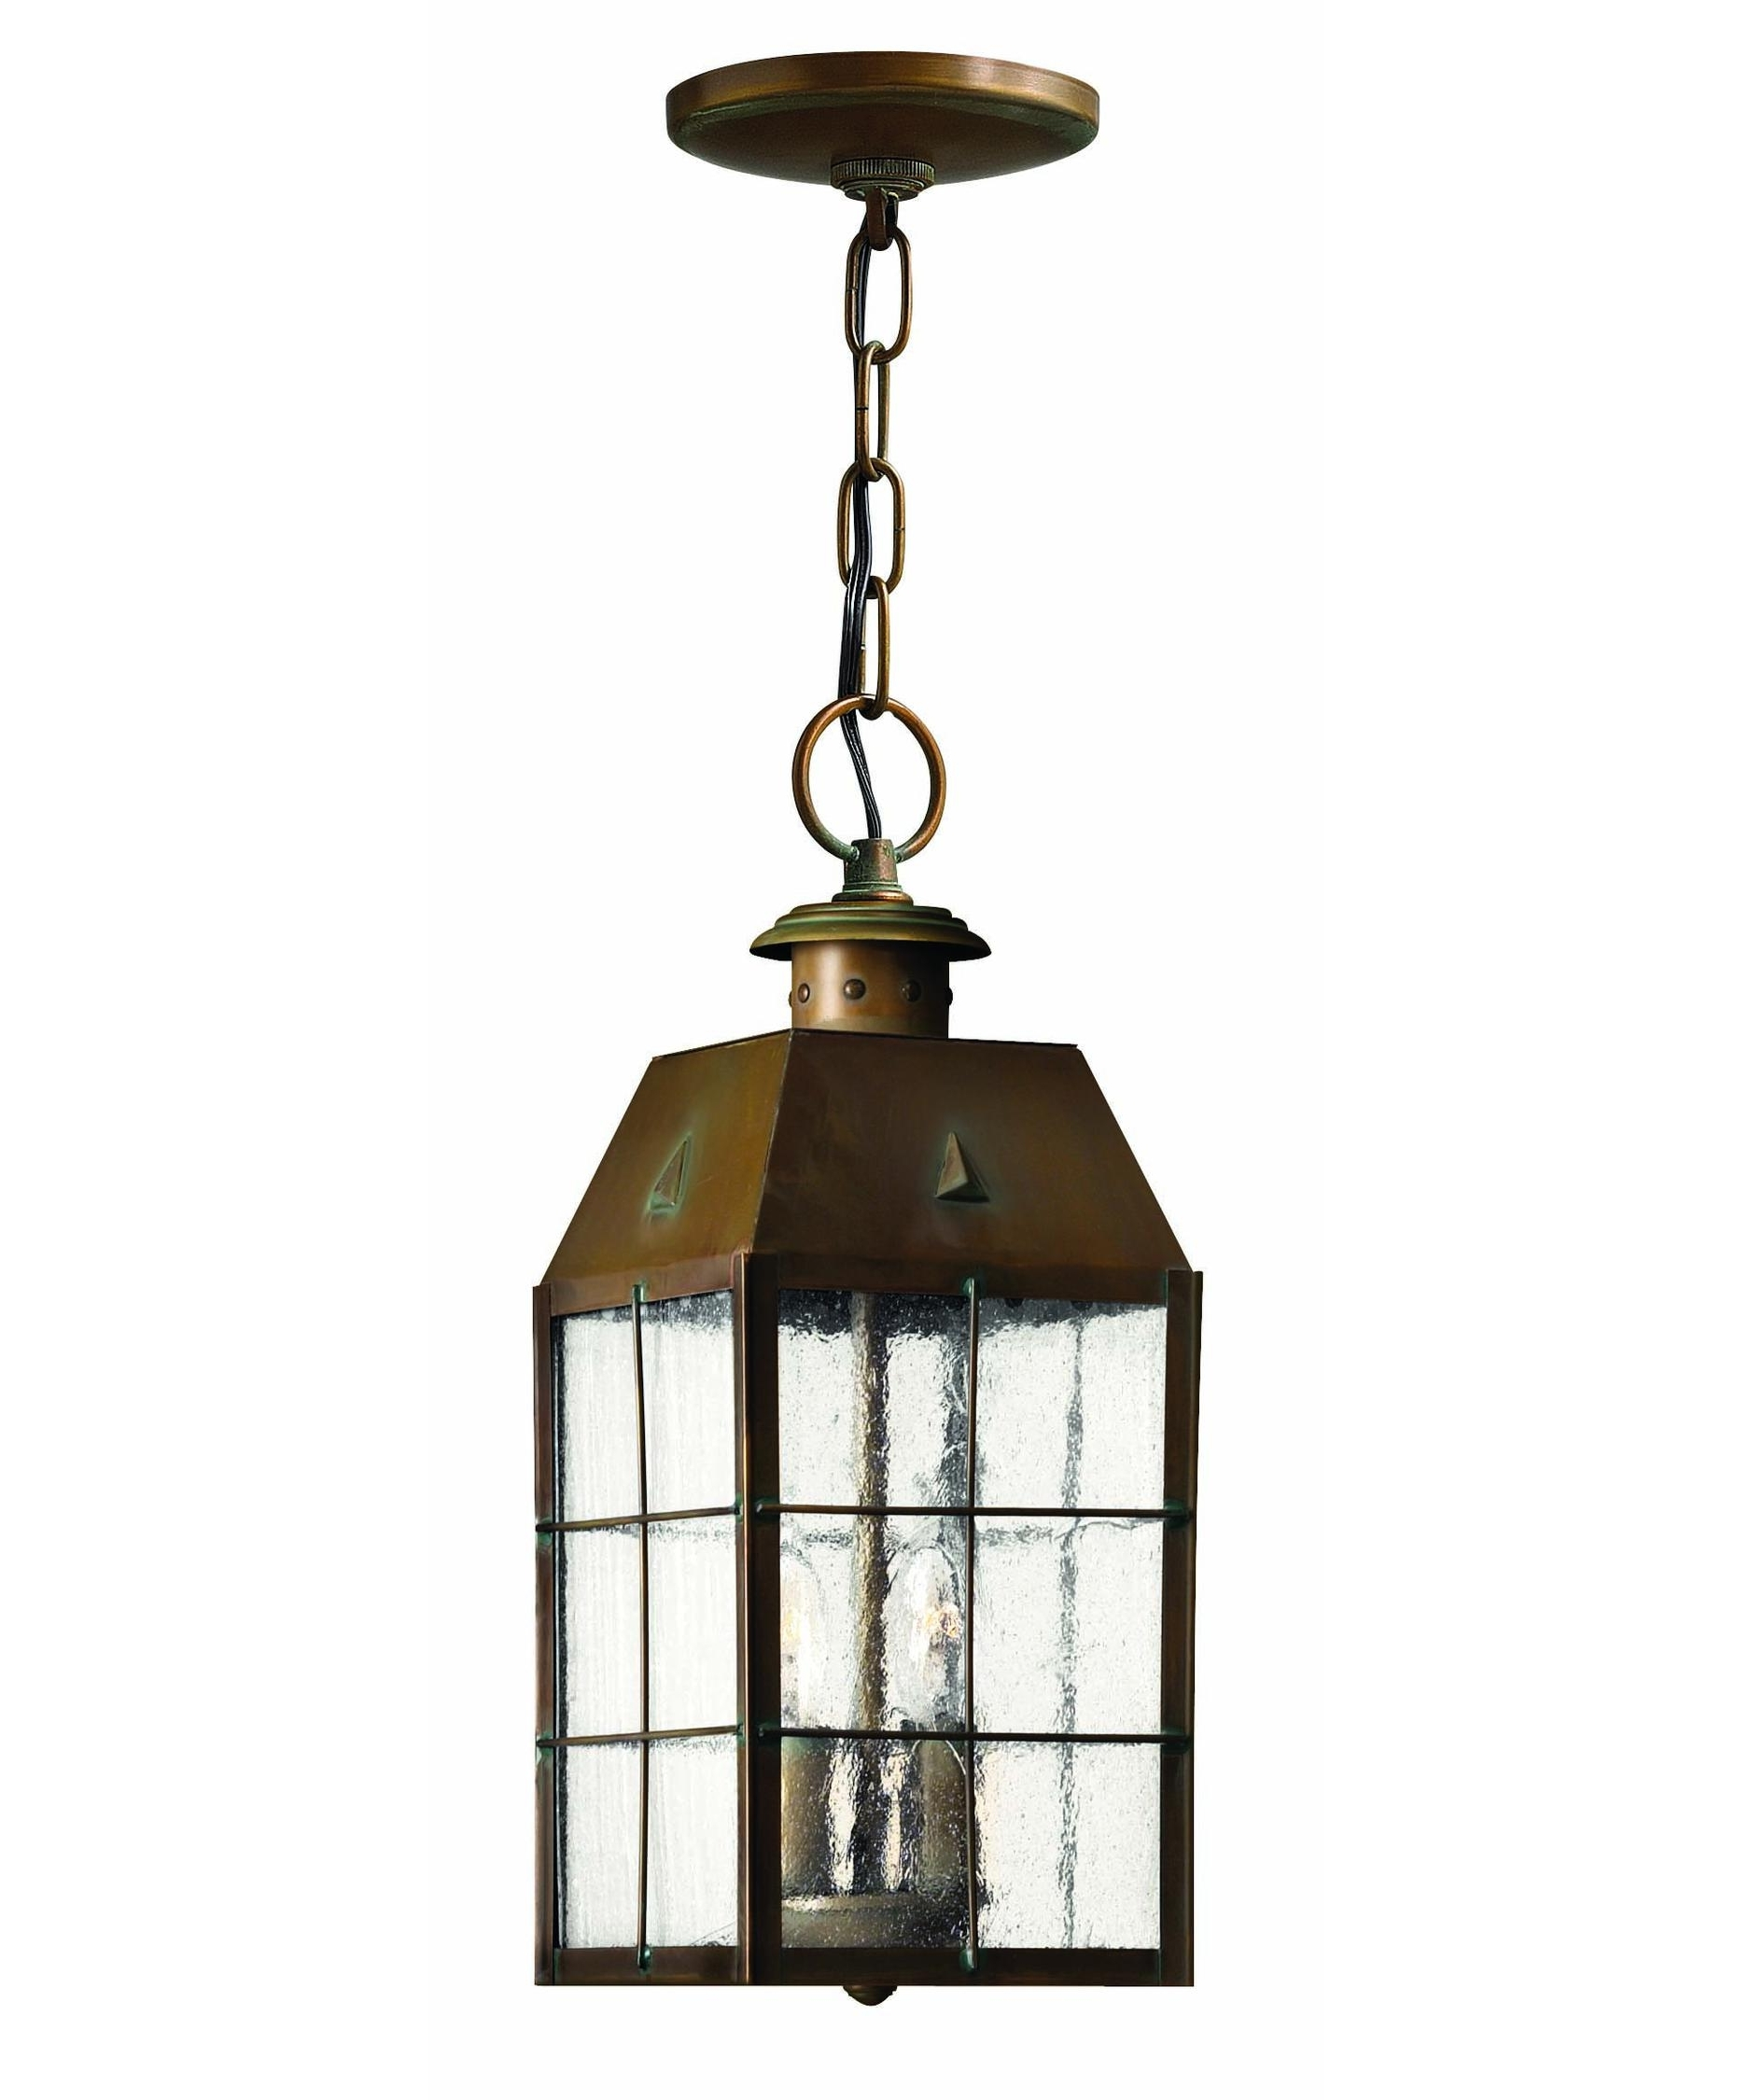 Favorite Hinkley Lighting 2372 Nantucket 6 Inch Wide 2 Light Outdoor Hanging Regarding Outdoor Hanging Entry Lights (View 7 of 20)